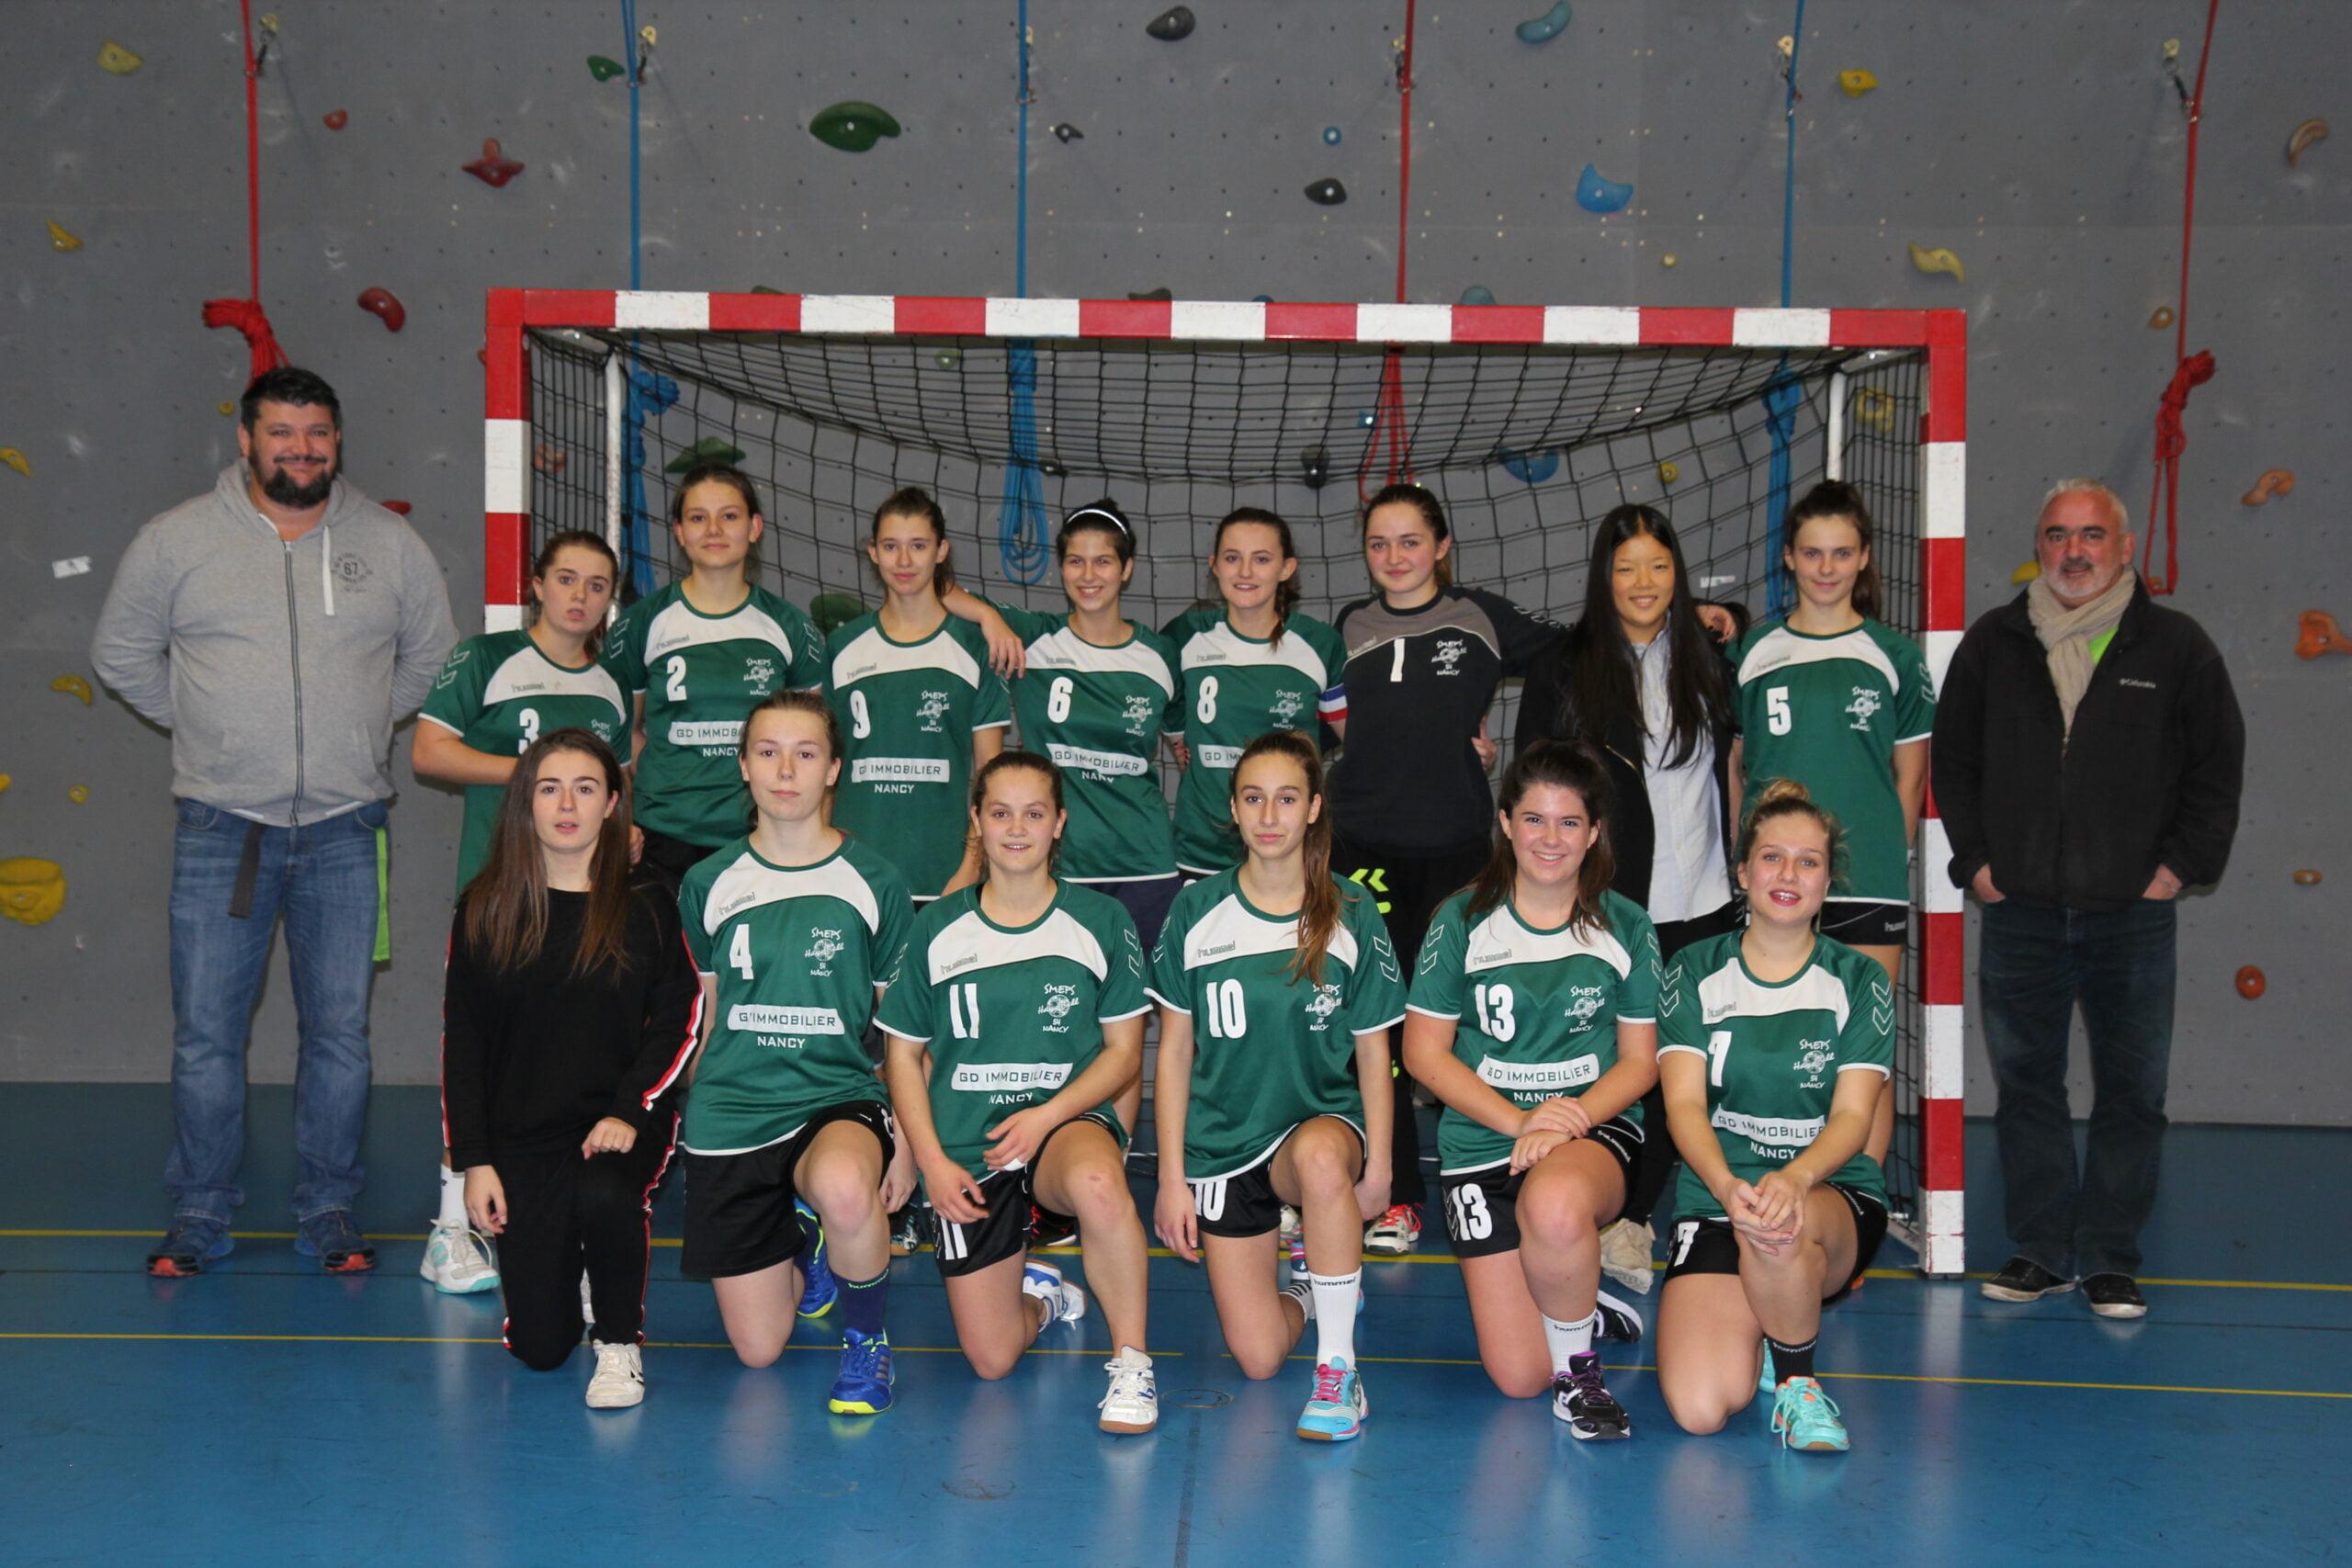 18-filles-Saison-2017-2018-scaled